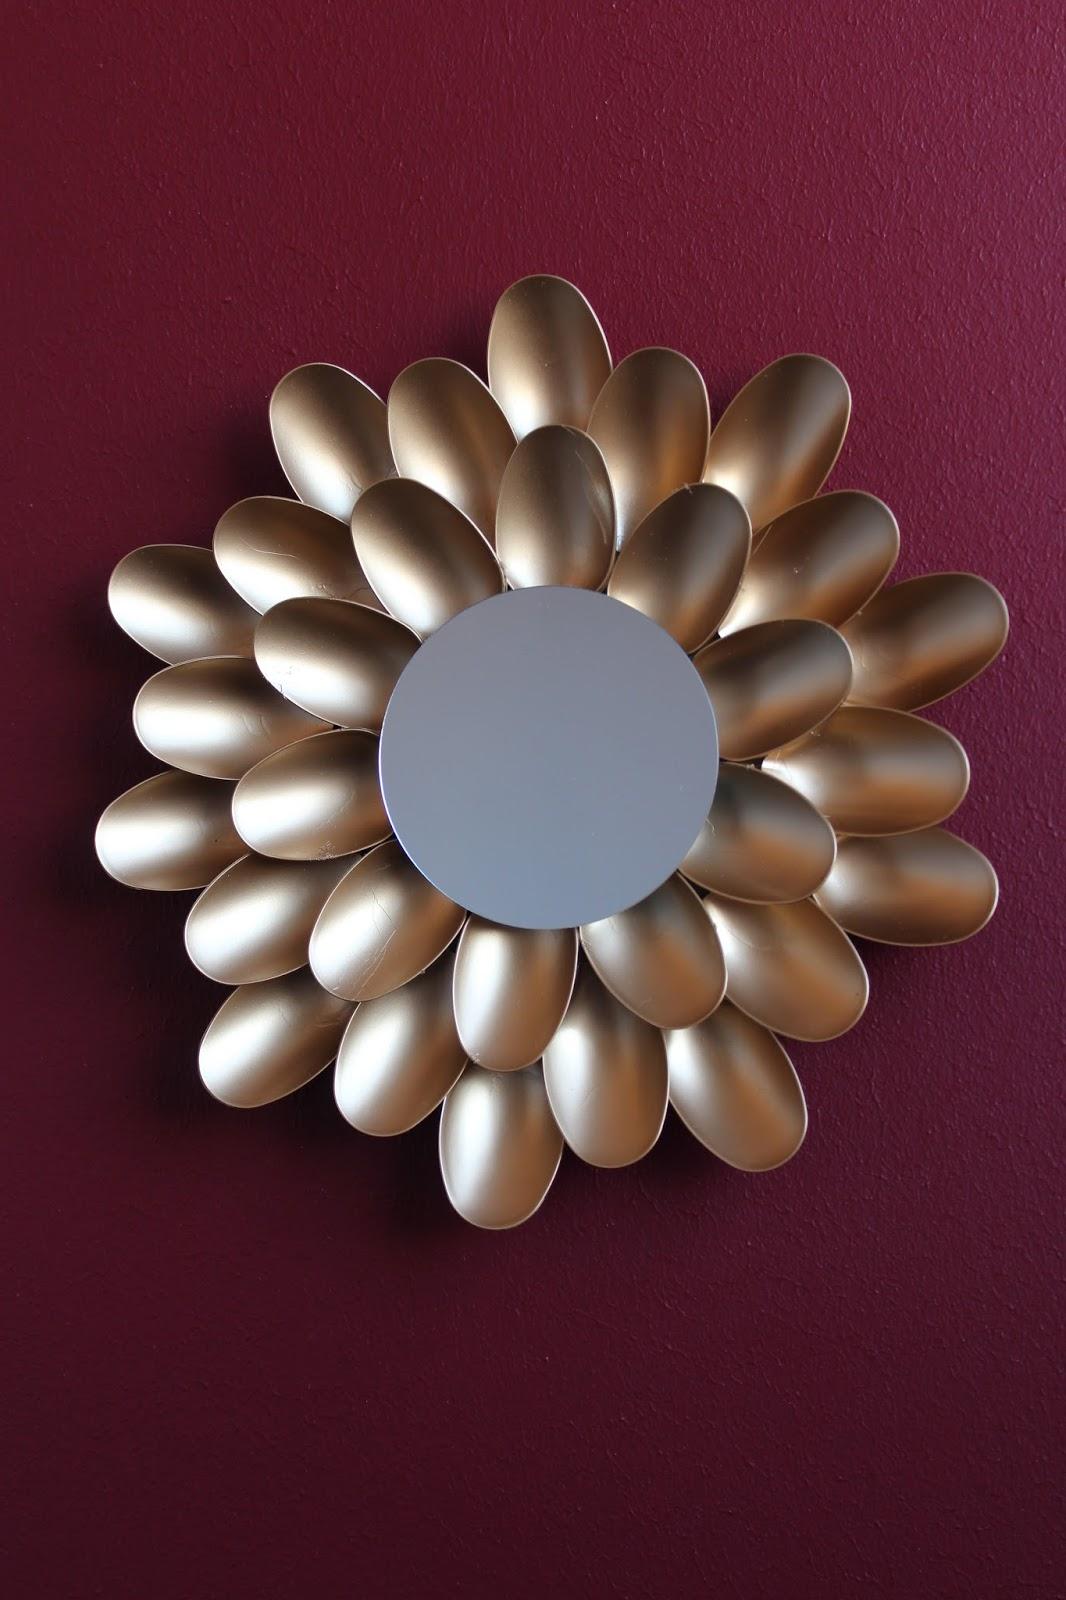 diy dekorativer spiegel plastikl ffel upcycling ars vera e diy blog f r kreative. Black Bedroom Furniture Sets. Home Design Ideas